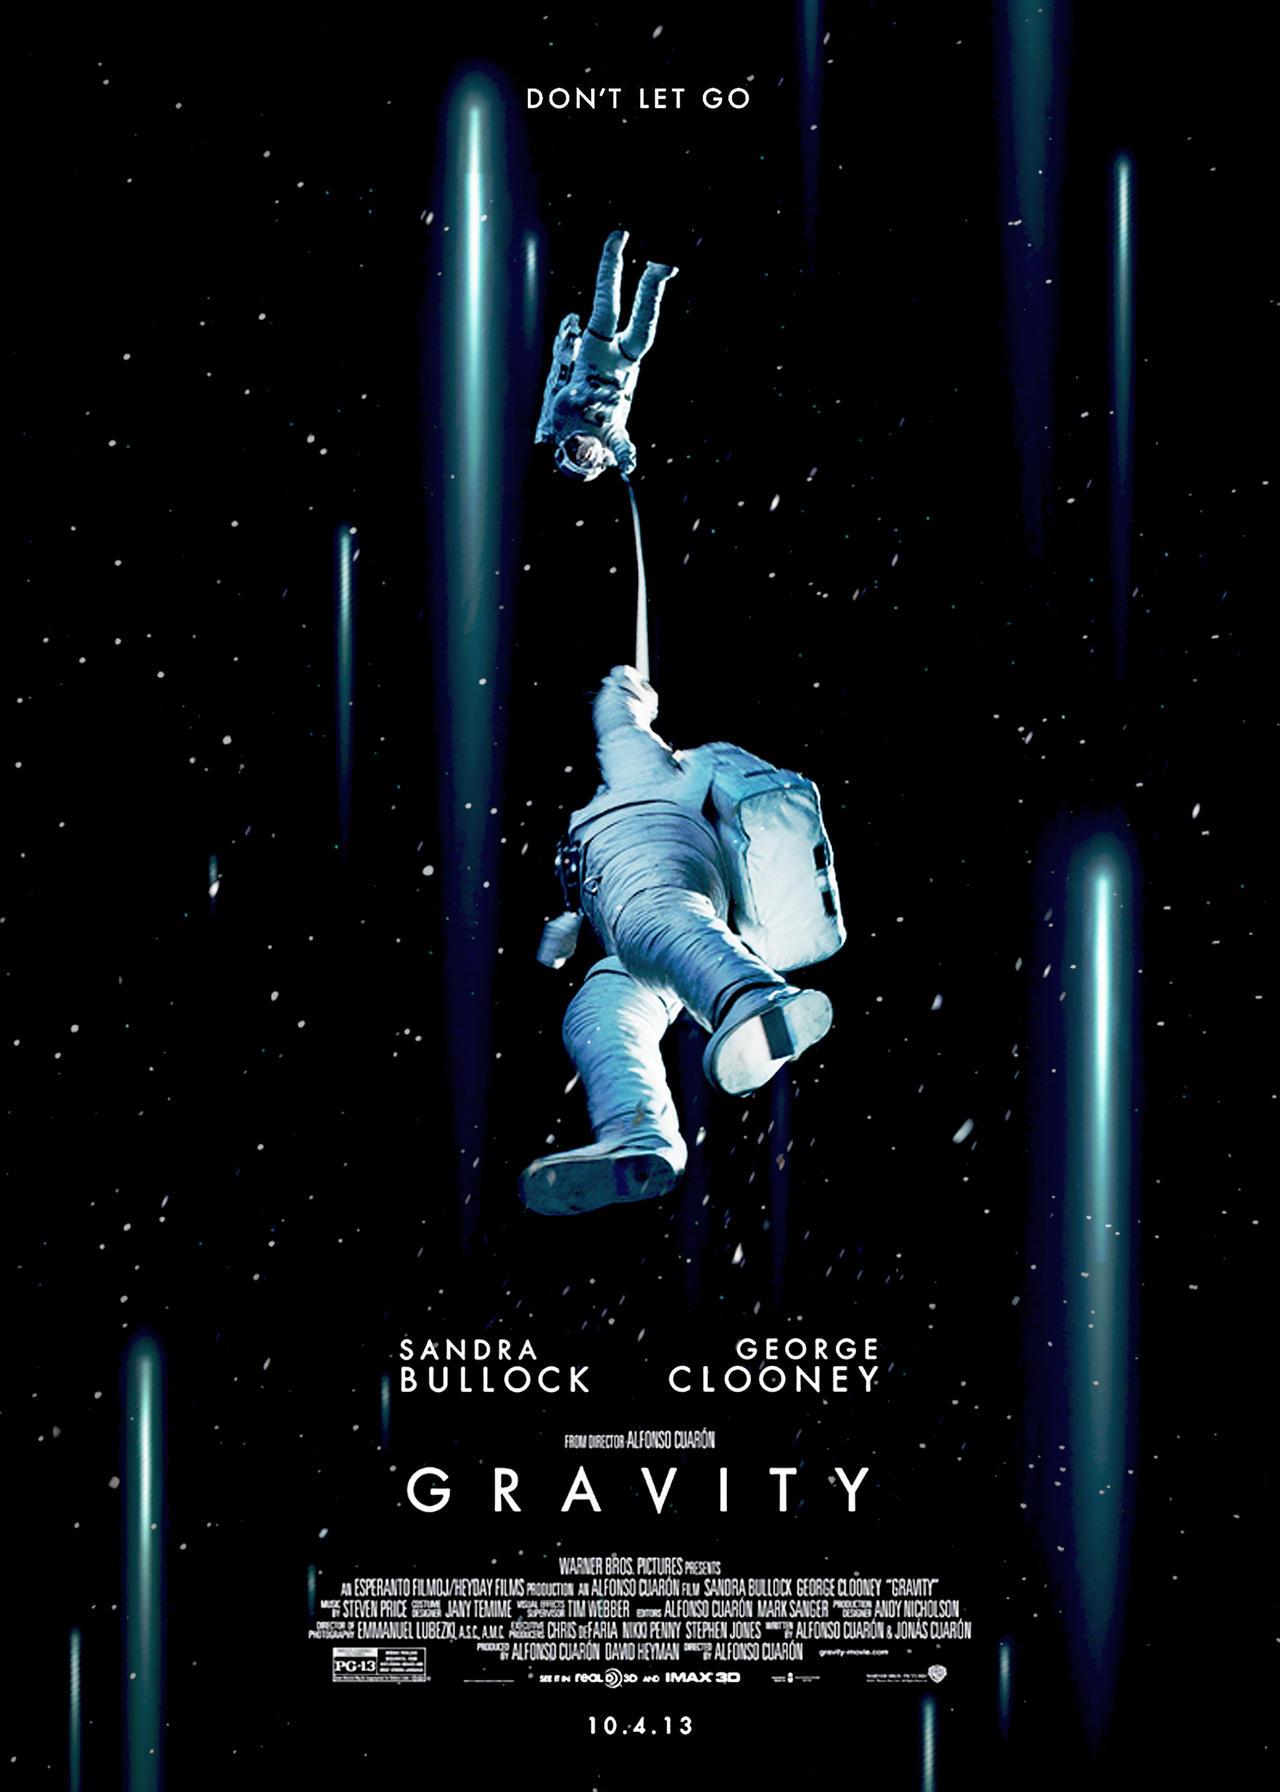 Gravity Movie Poster by Olenar on DeviantArt